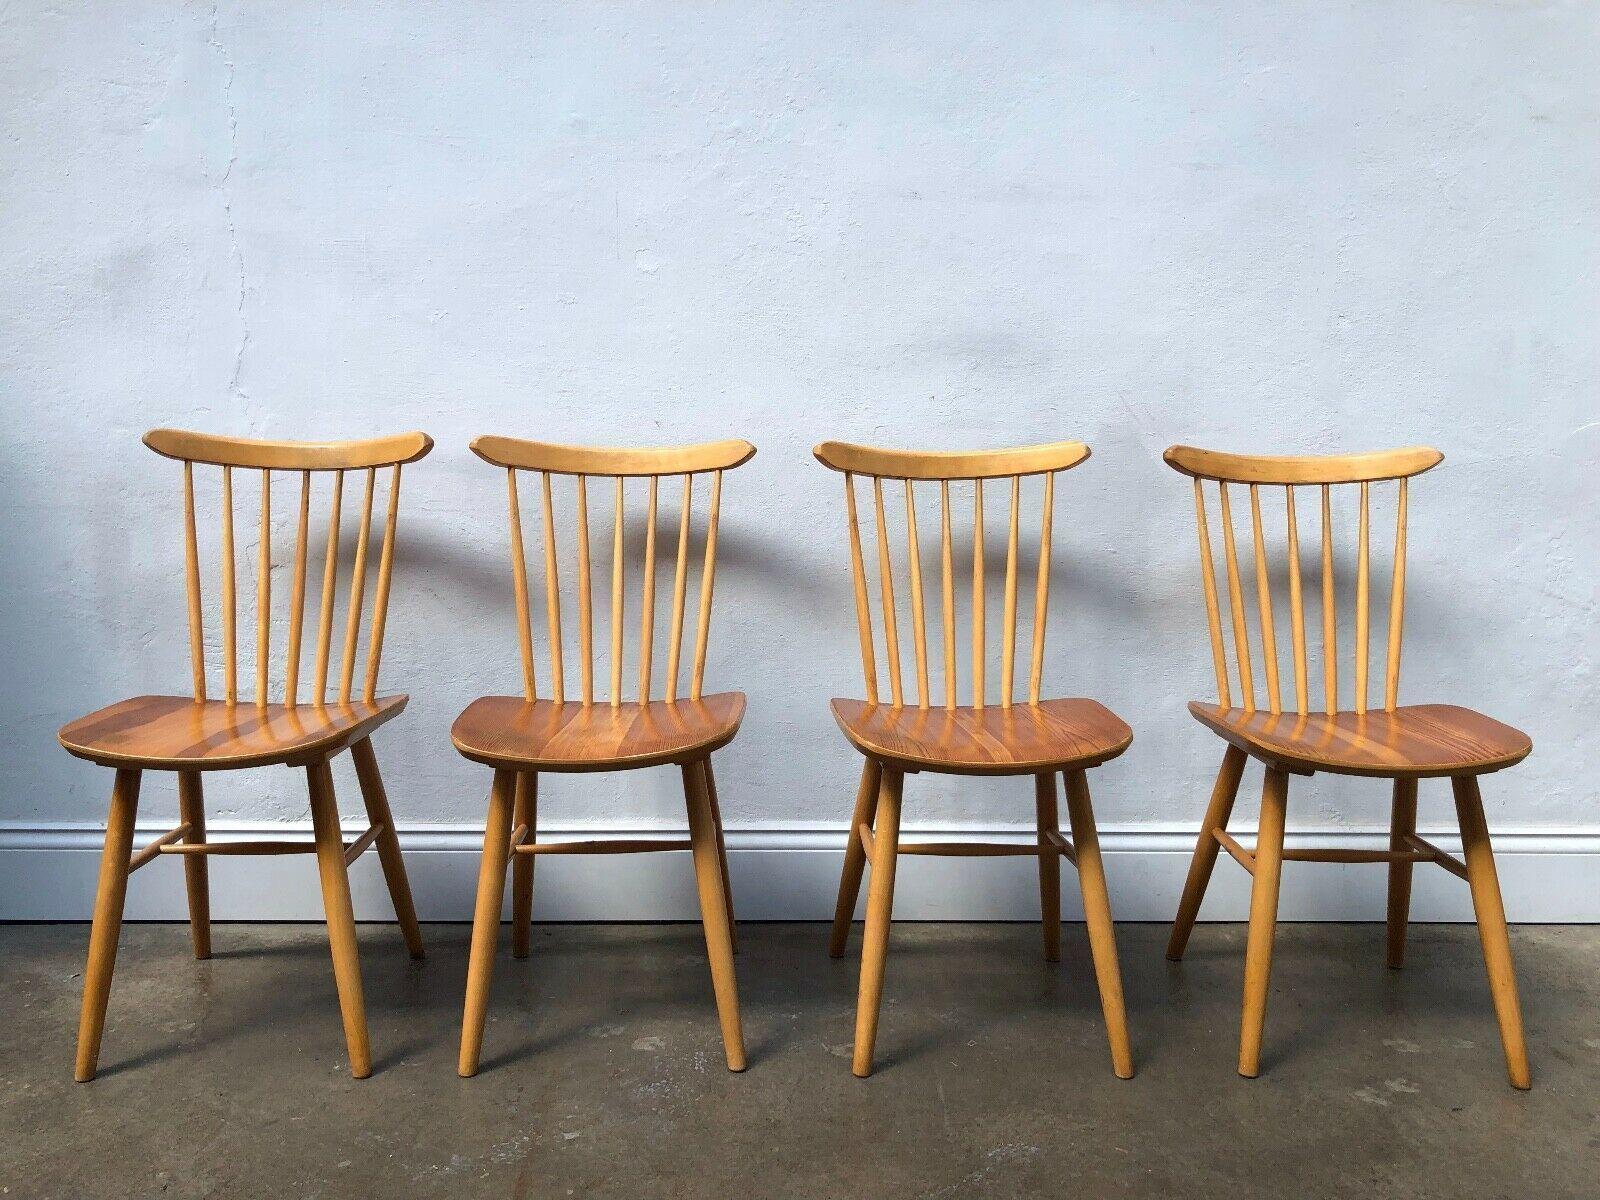 Picture of: Vintage Set Of 4 Farstrup Danish Dining Chairs G Plan Mid Century Retro Ercol Vinterior